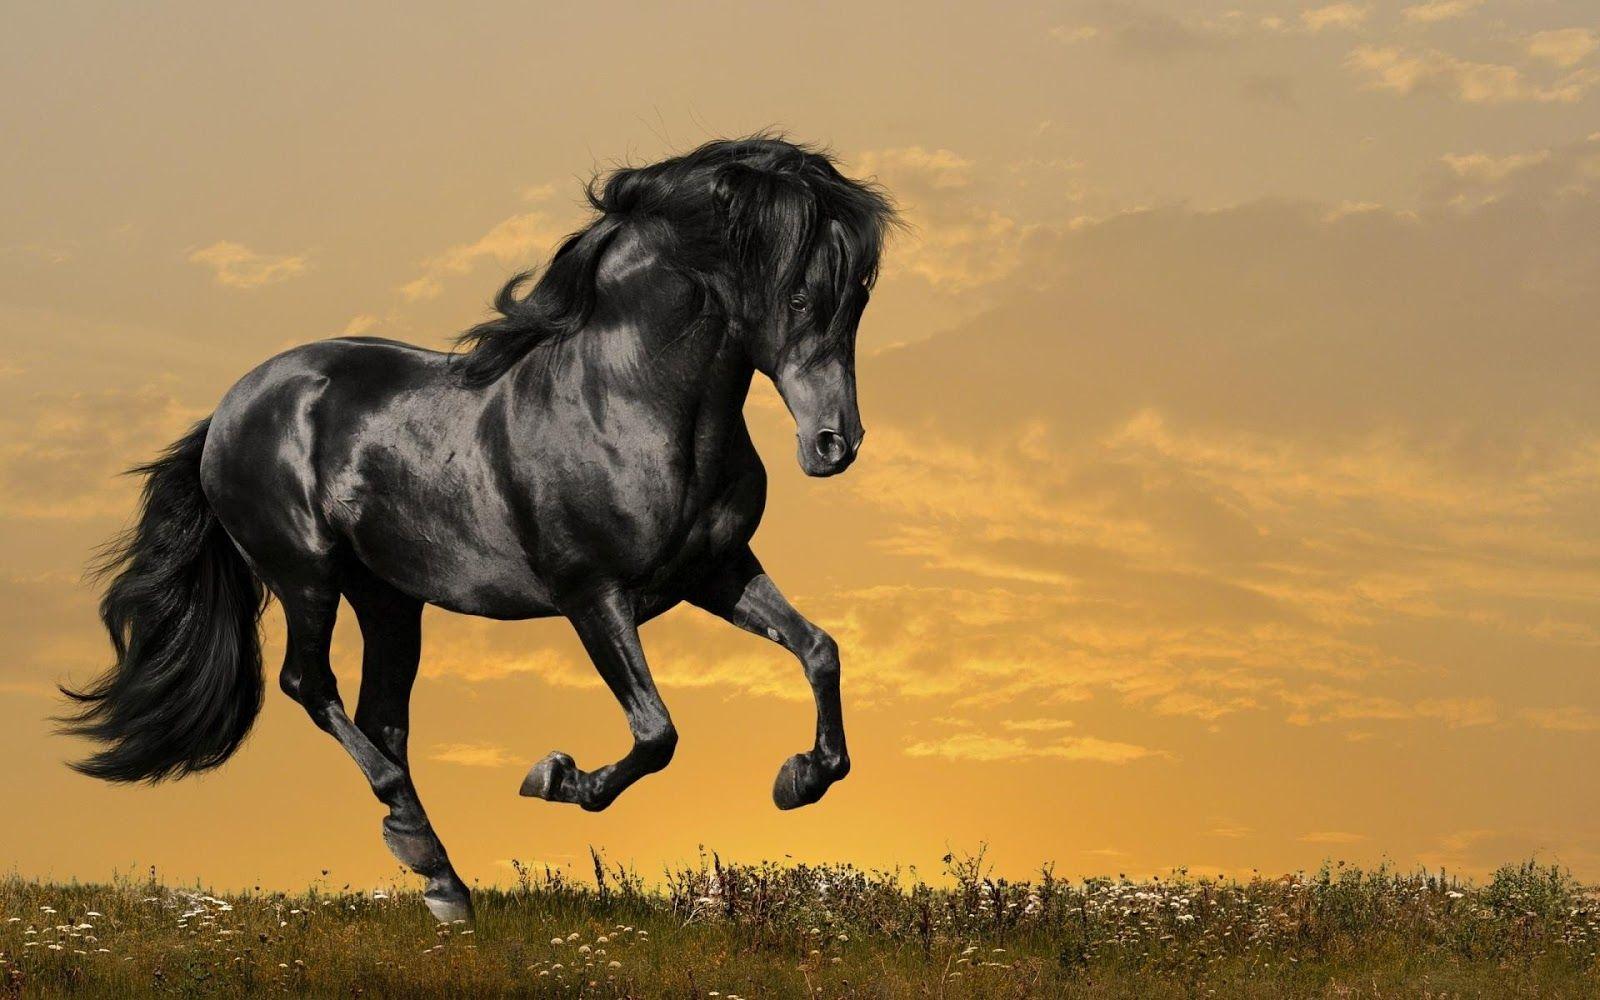 12 Amazing Black Horse Wallpapers Hd Tapandaola111 Horse Wallpaper Beautiful Horses Horses